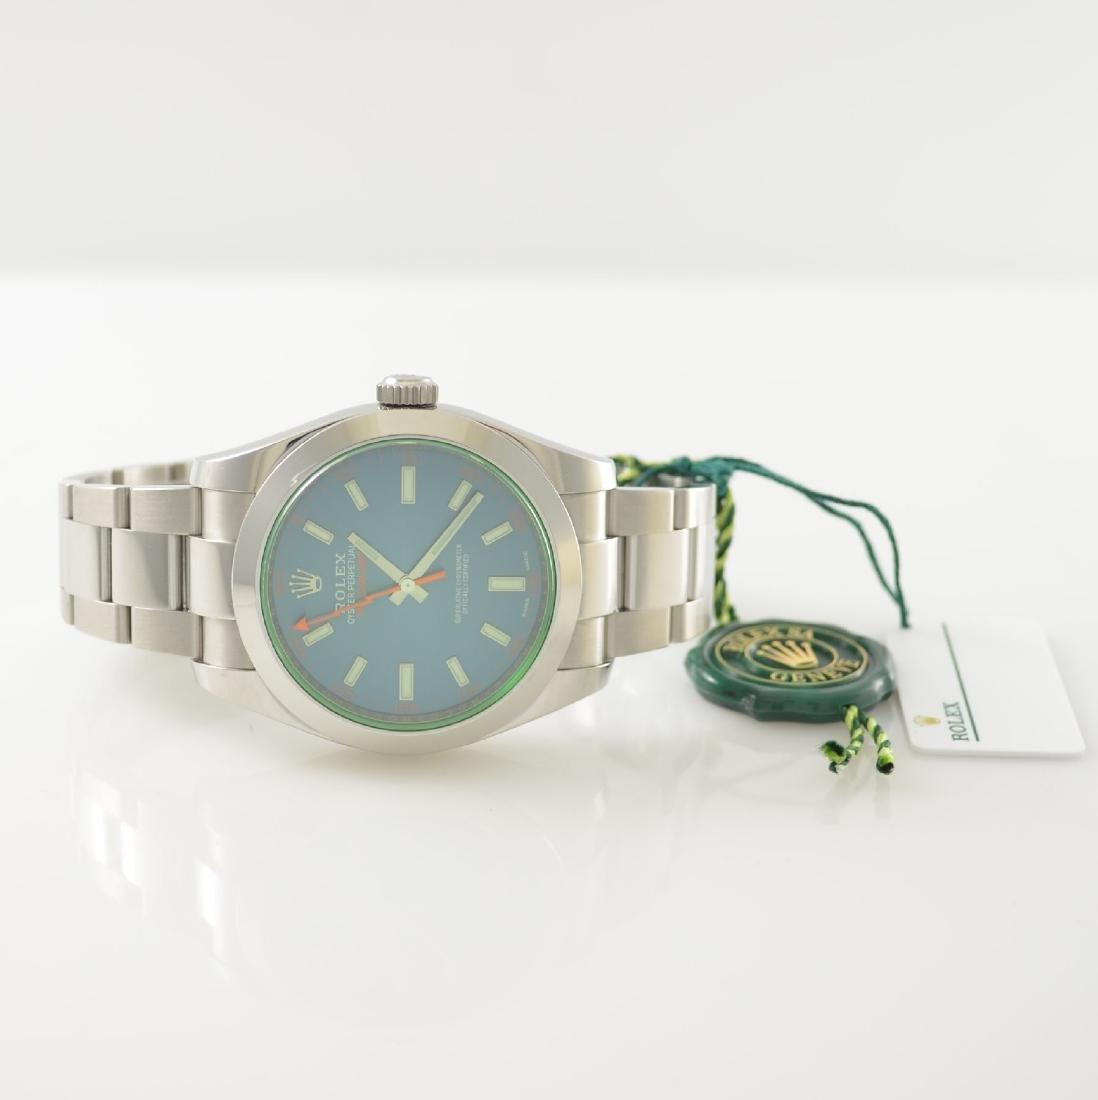 ROLEX wristwatch Oyster Perpetual Milgauss 116400GV